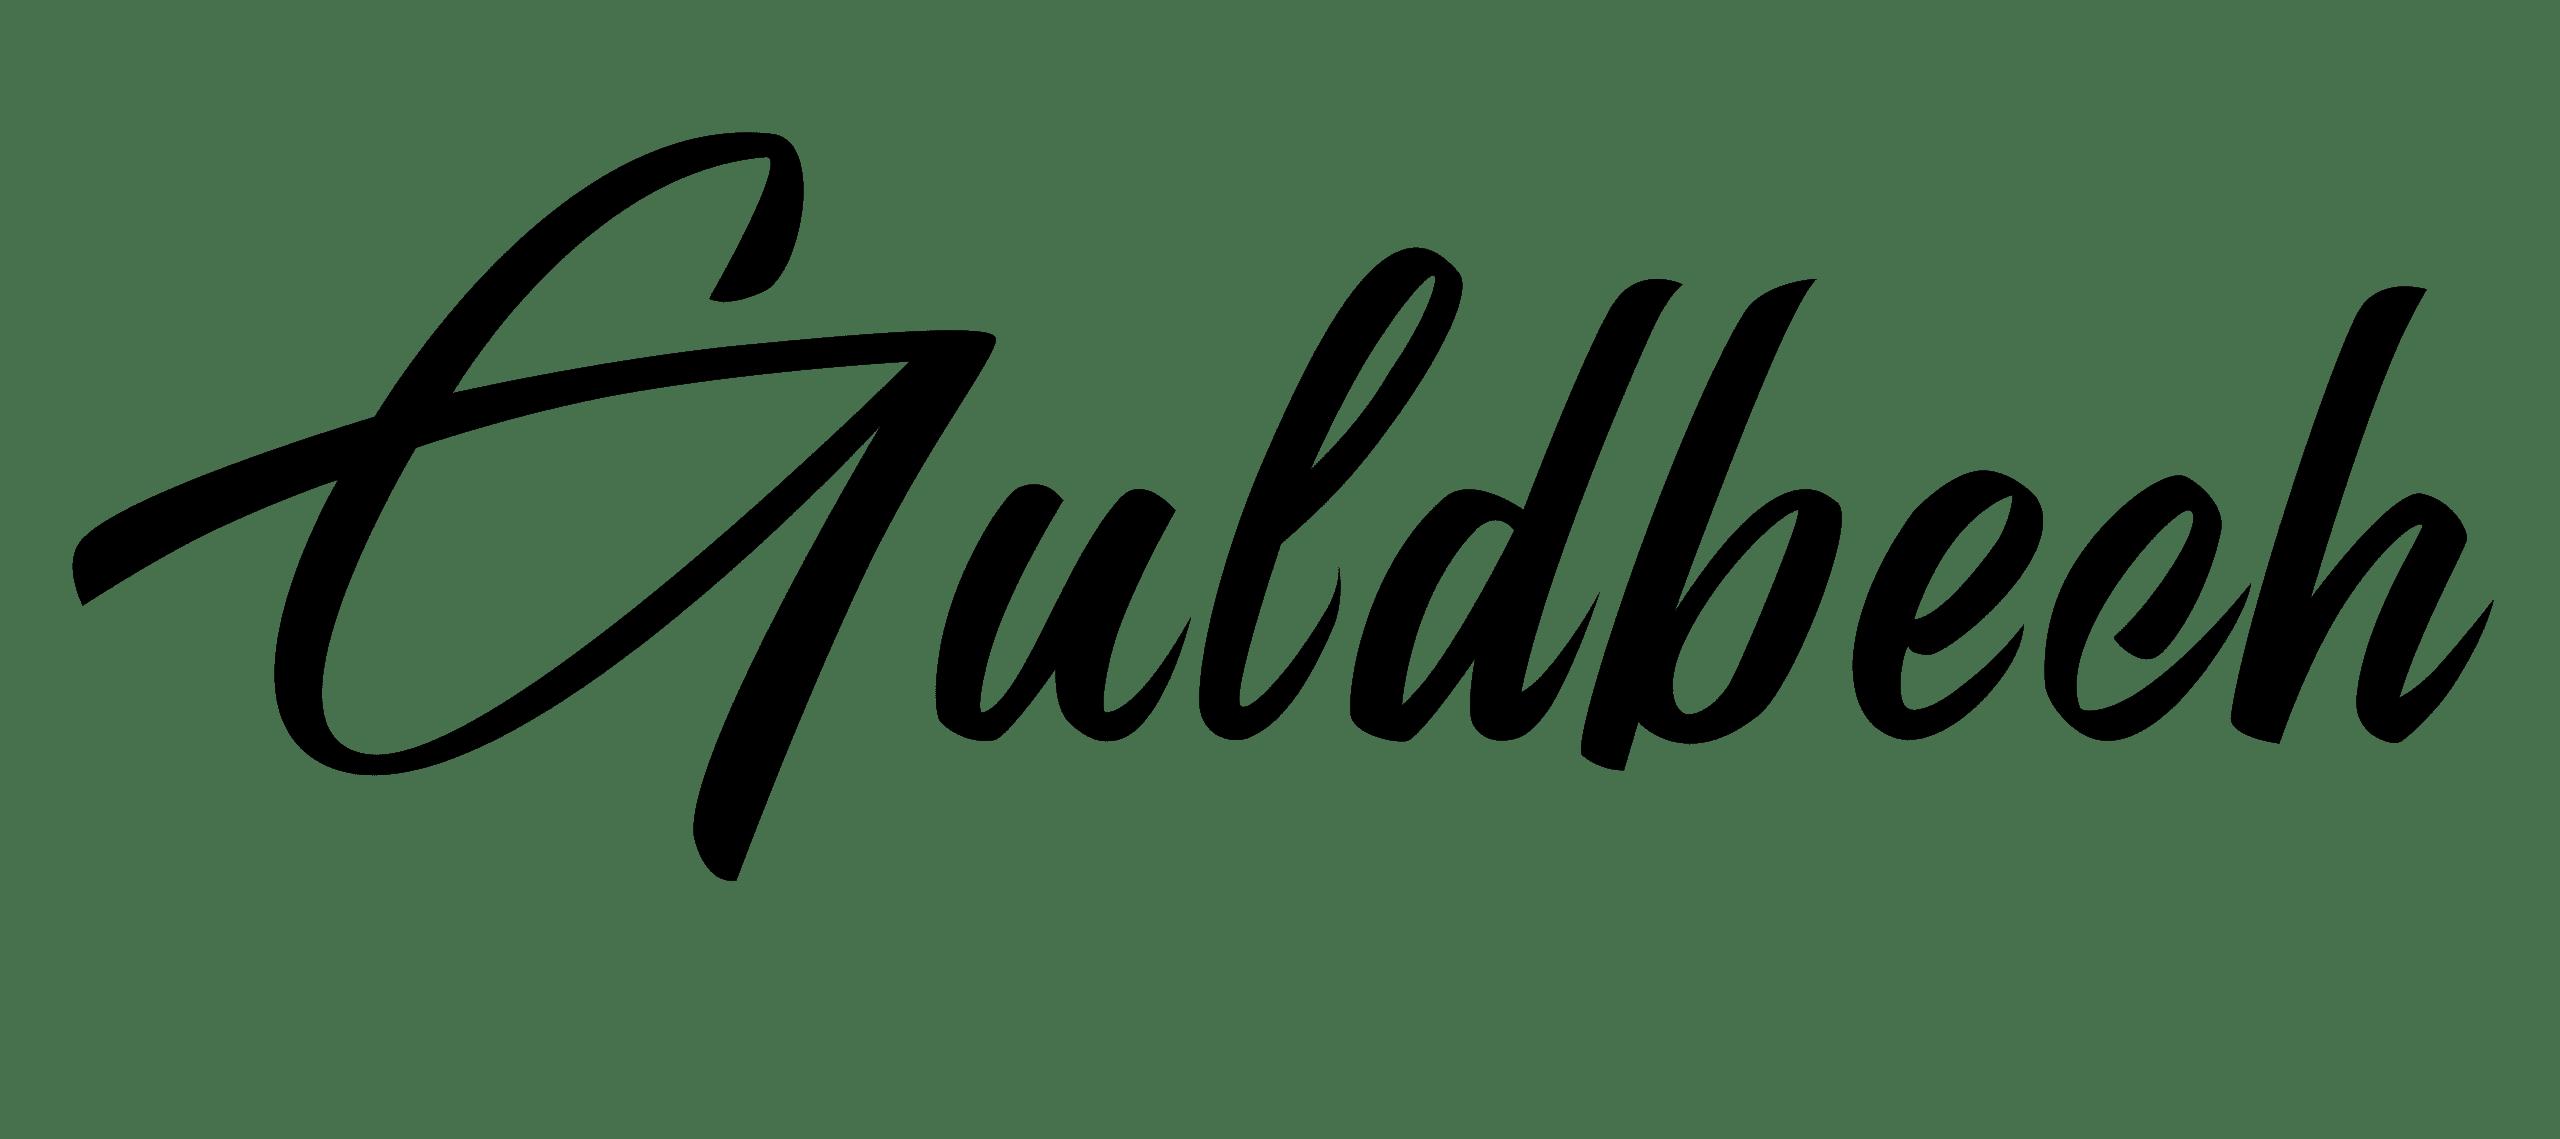 Guldbech Ure & Smykker